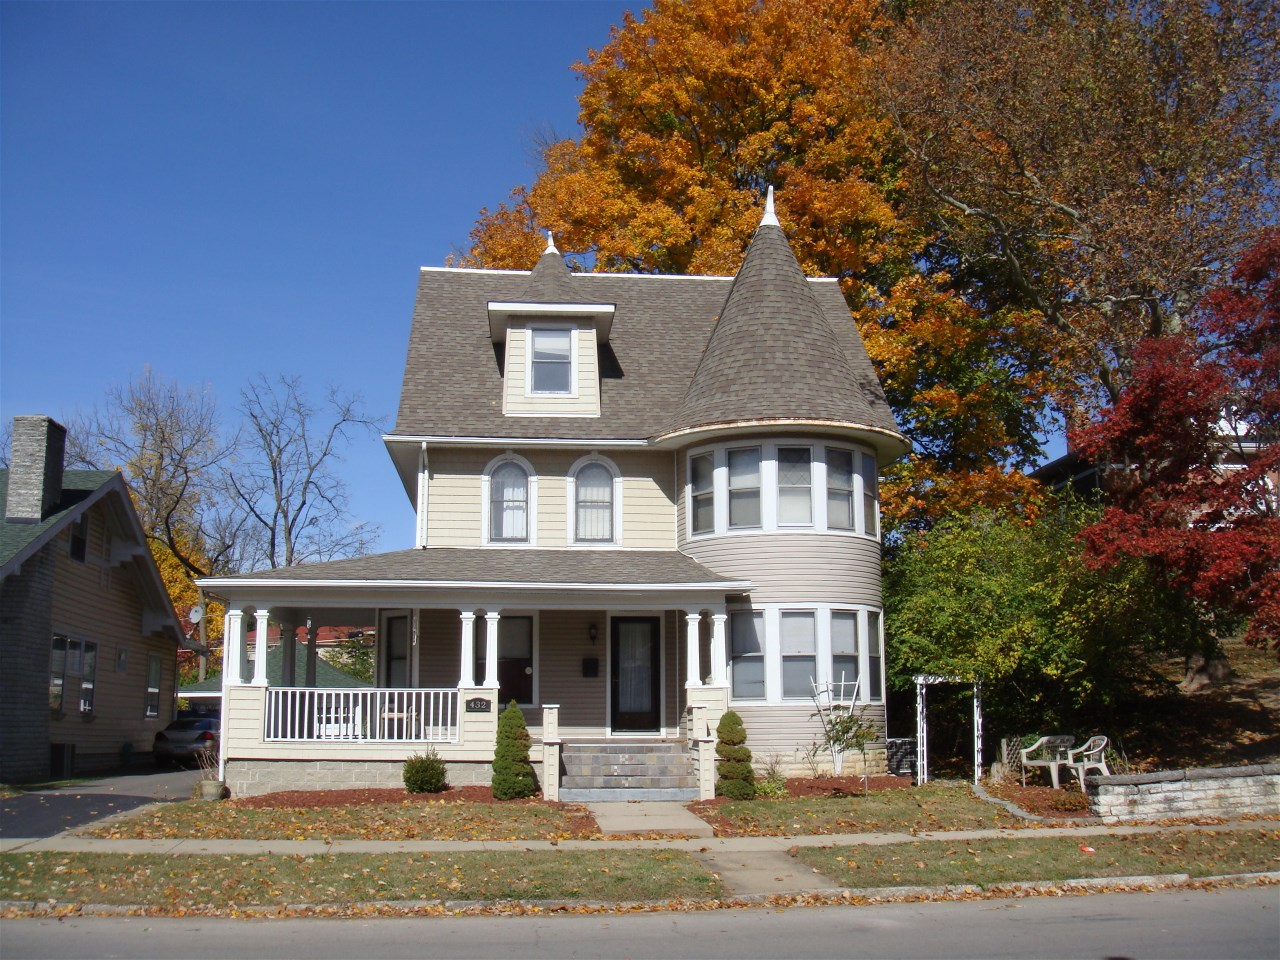 432 E. Main St., Greensburg, Indiana 47240